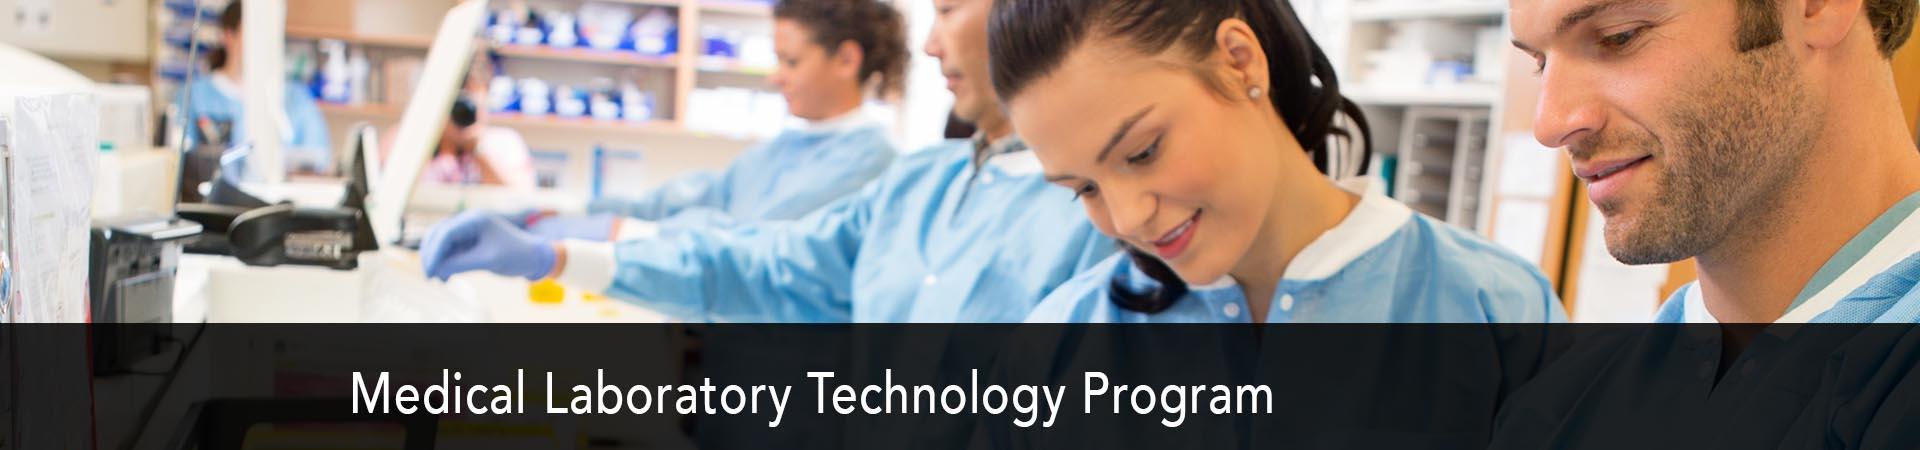 Explore the Medical Laboratory Technology Program at NC